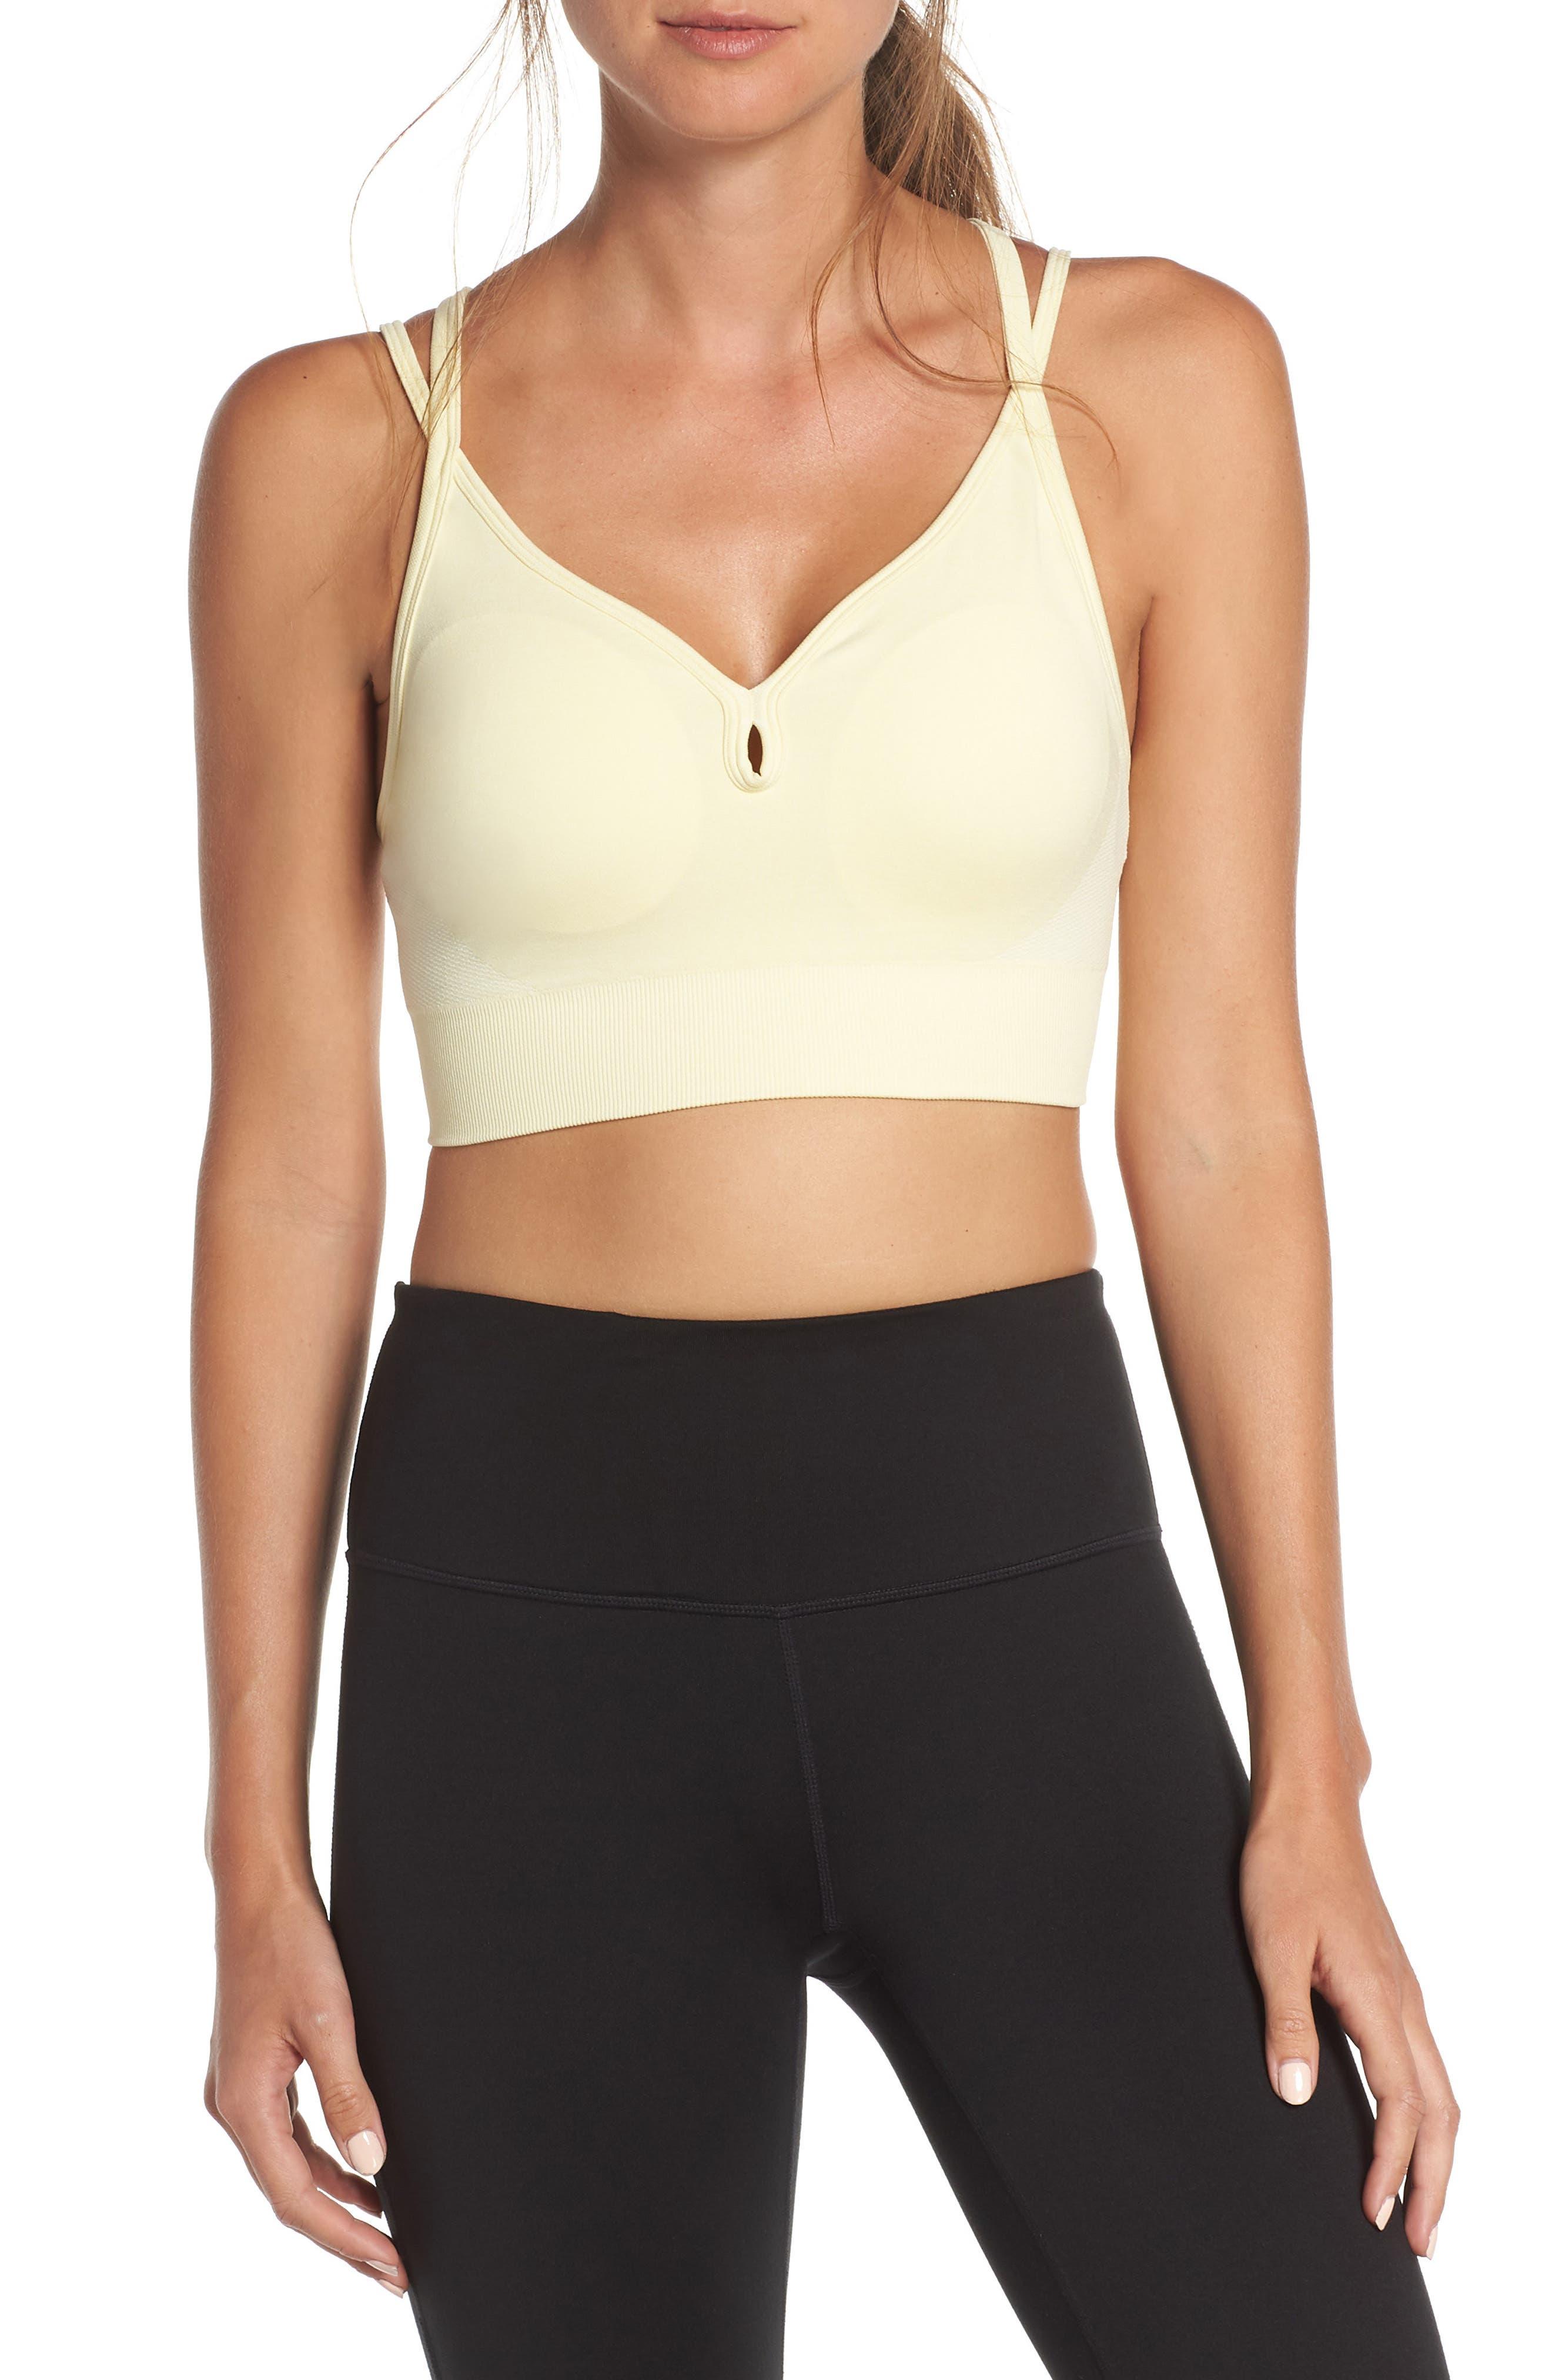 nike front closure sports bra